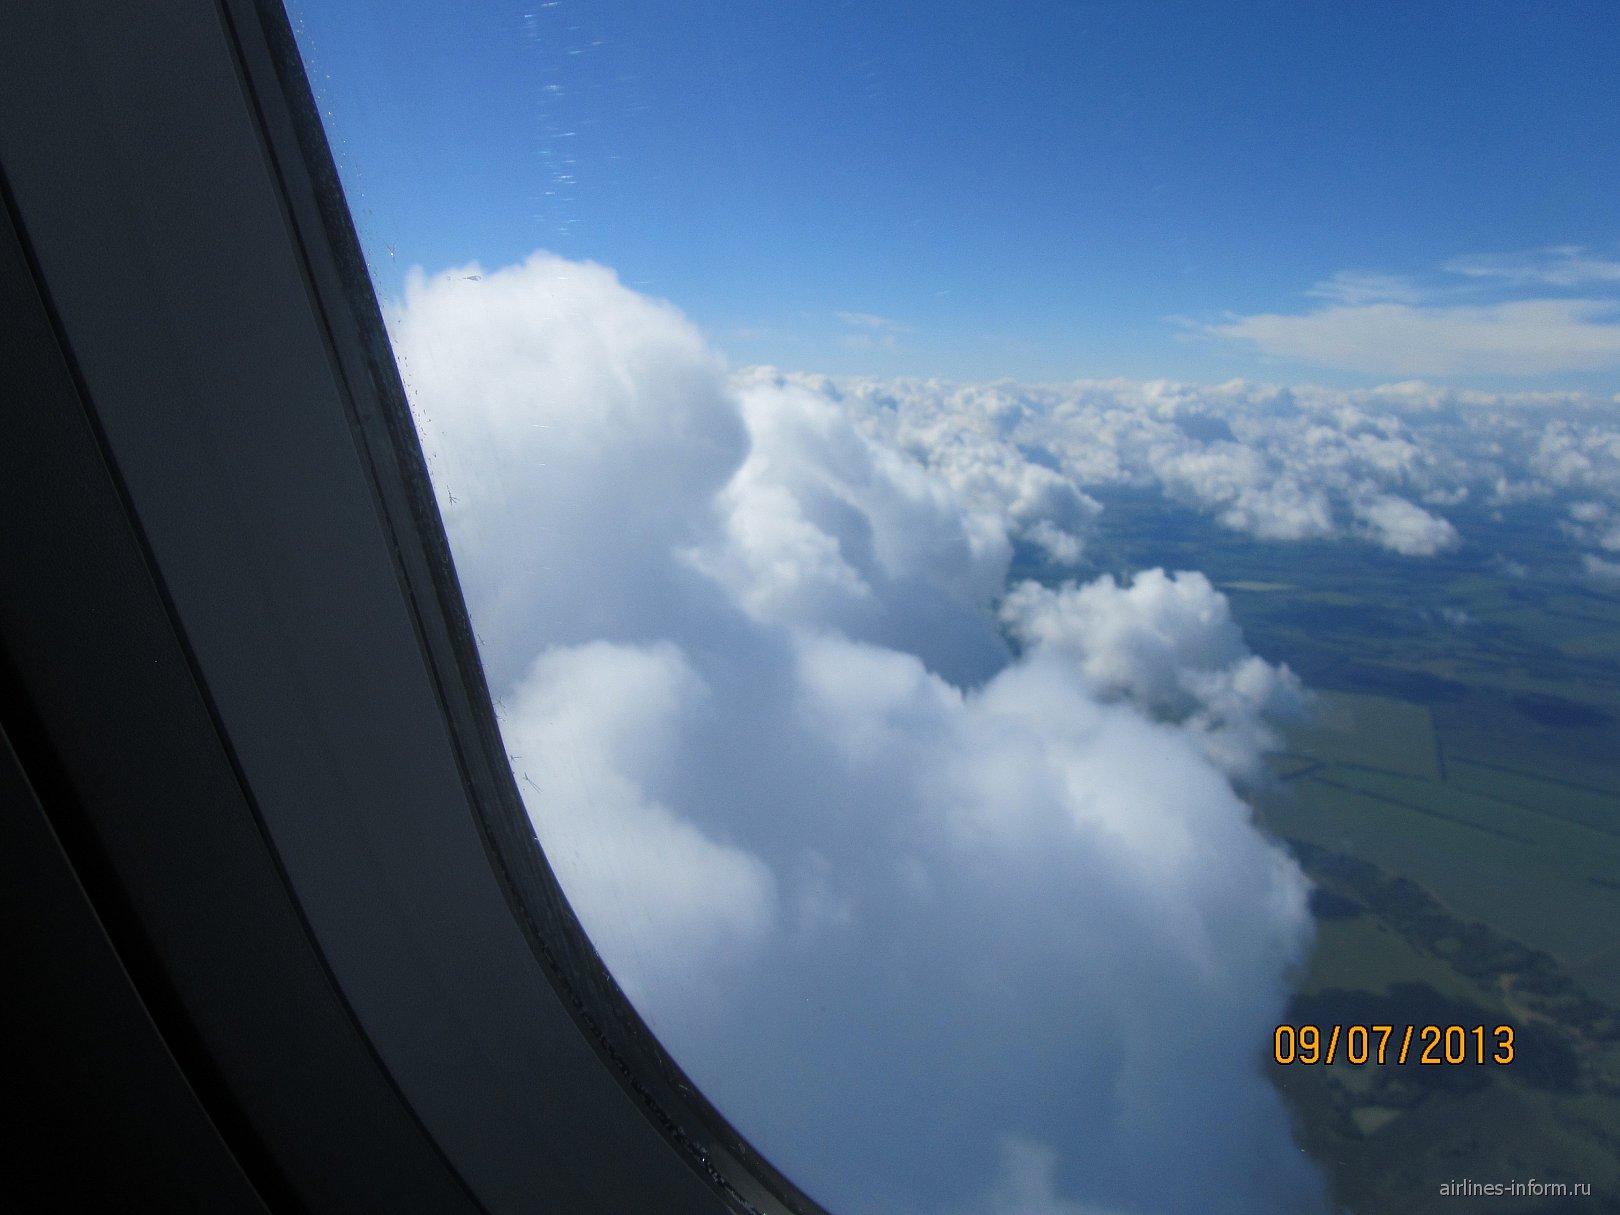 Рейс S7 Airlines Пекин-Новосибирск